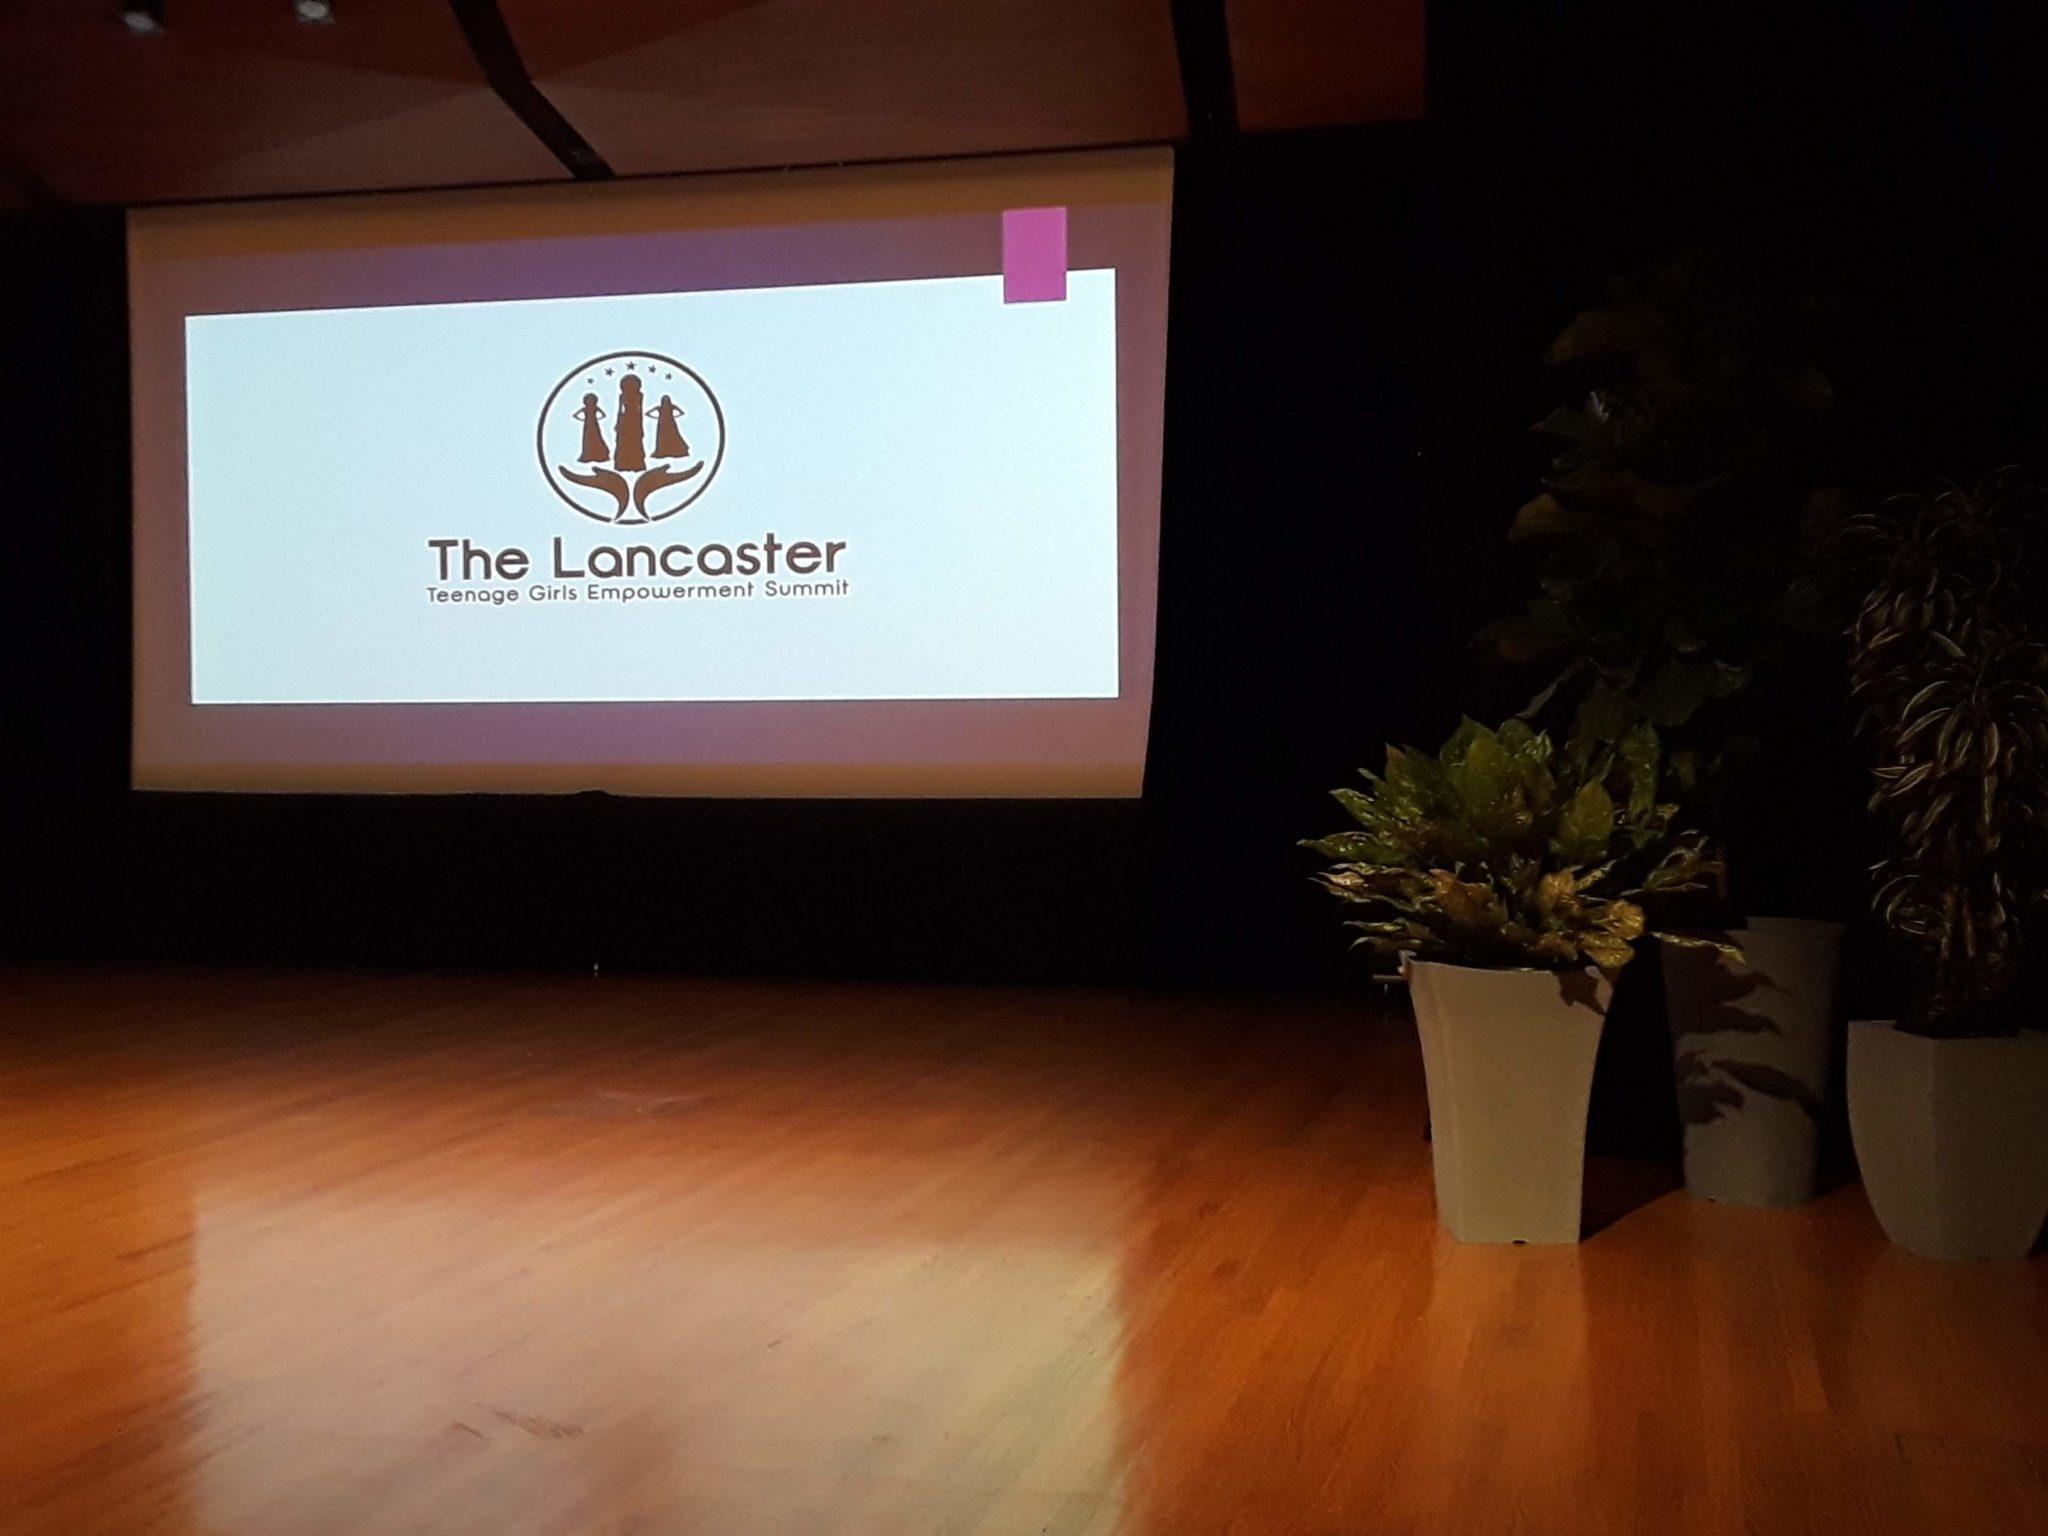 the lancaster teenager girls empowerment summit banner